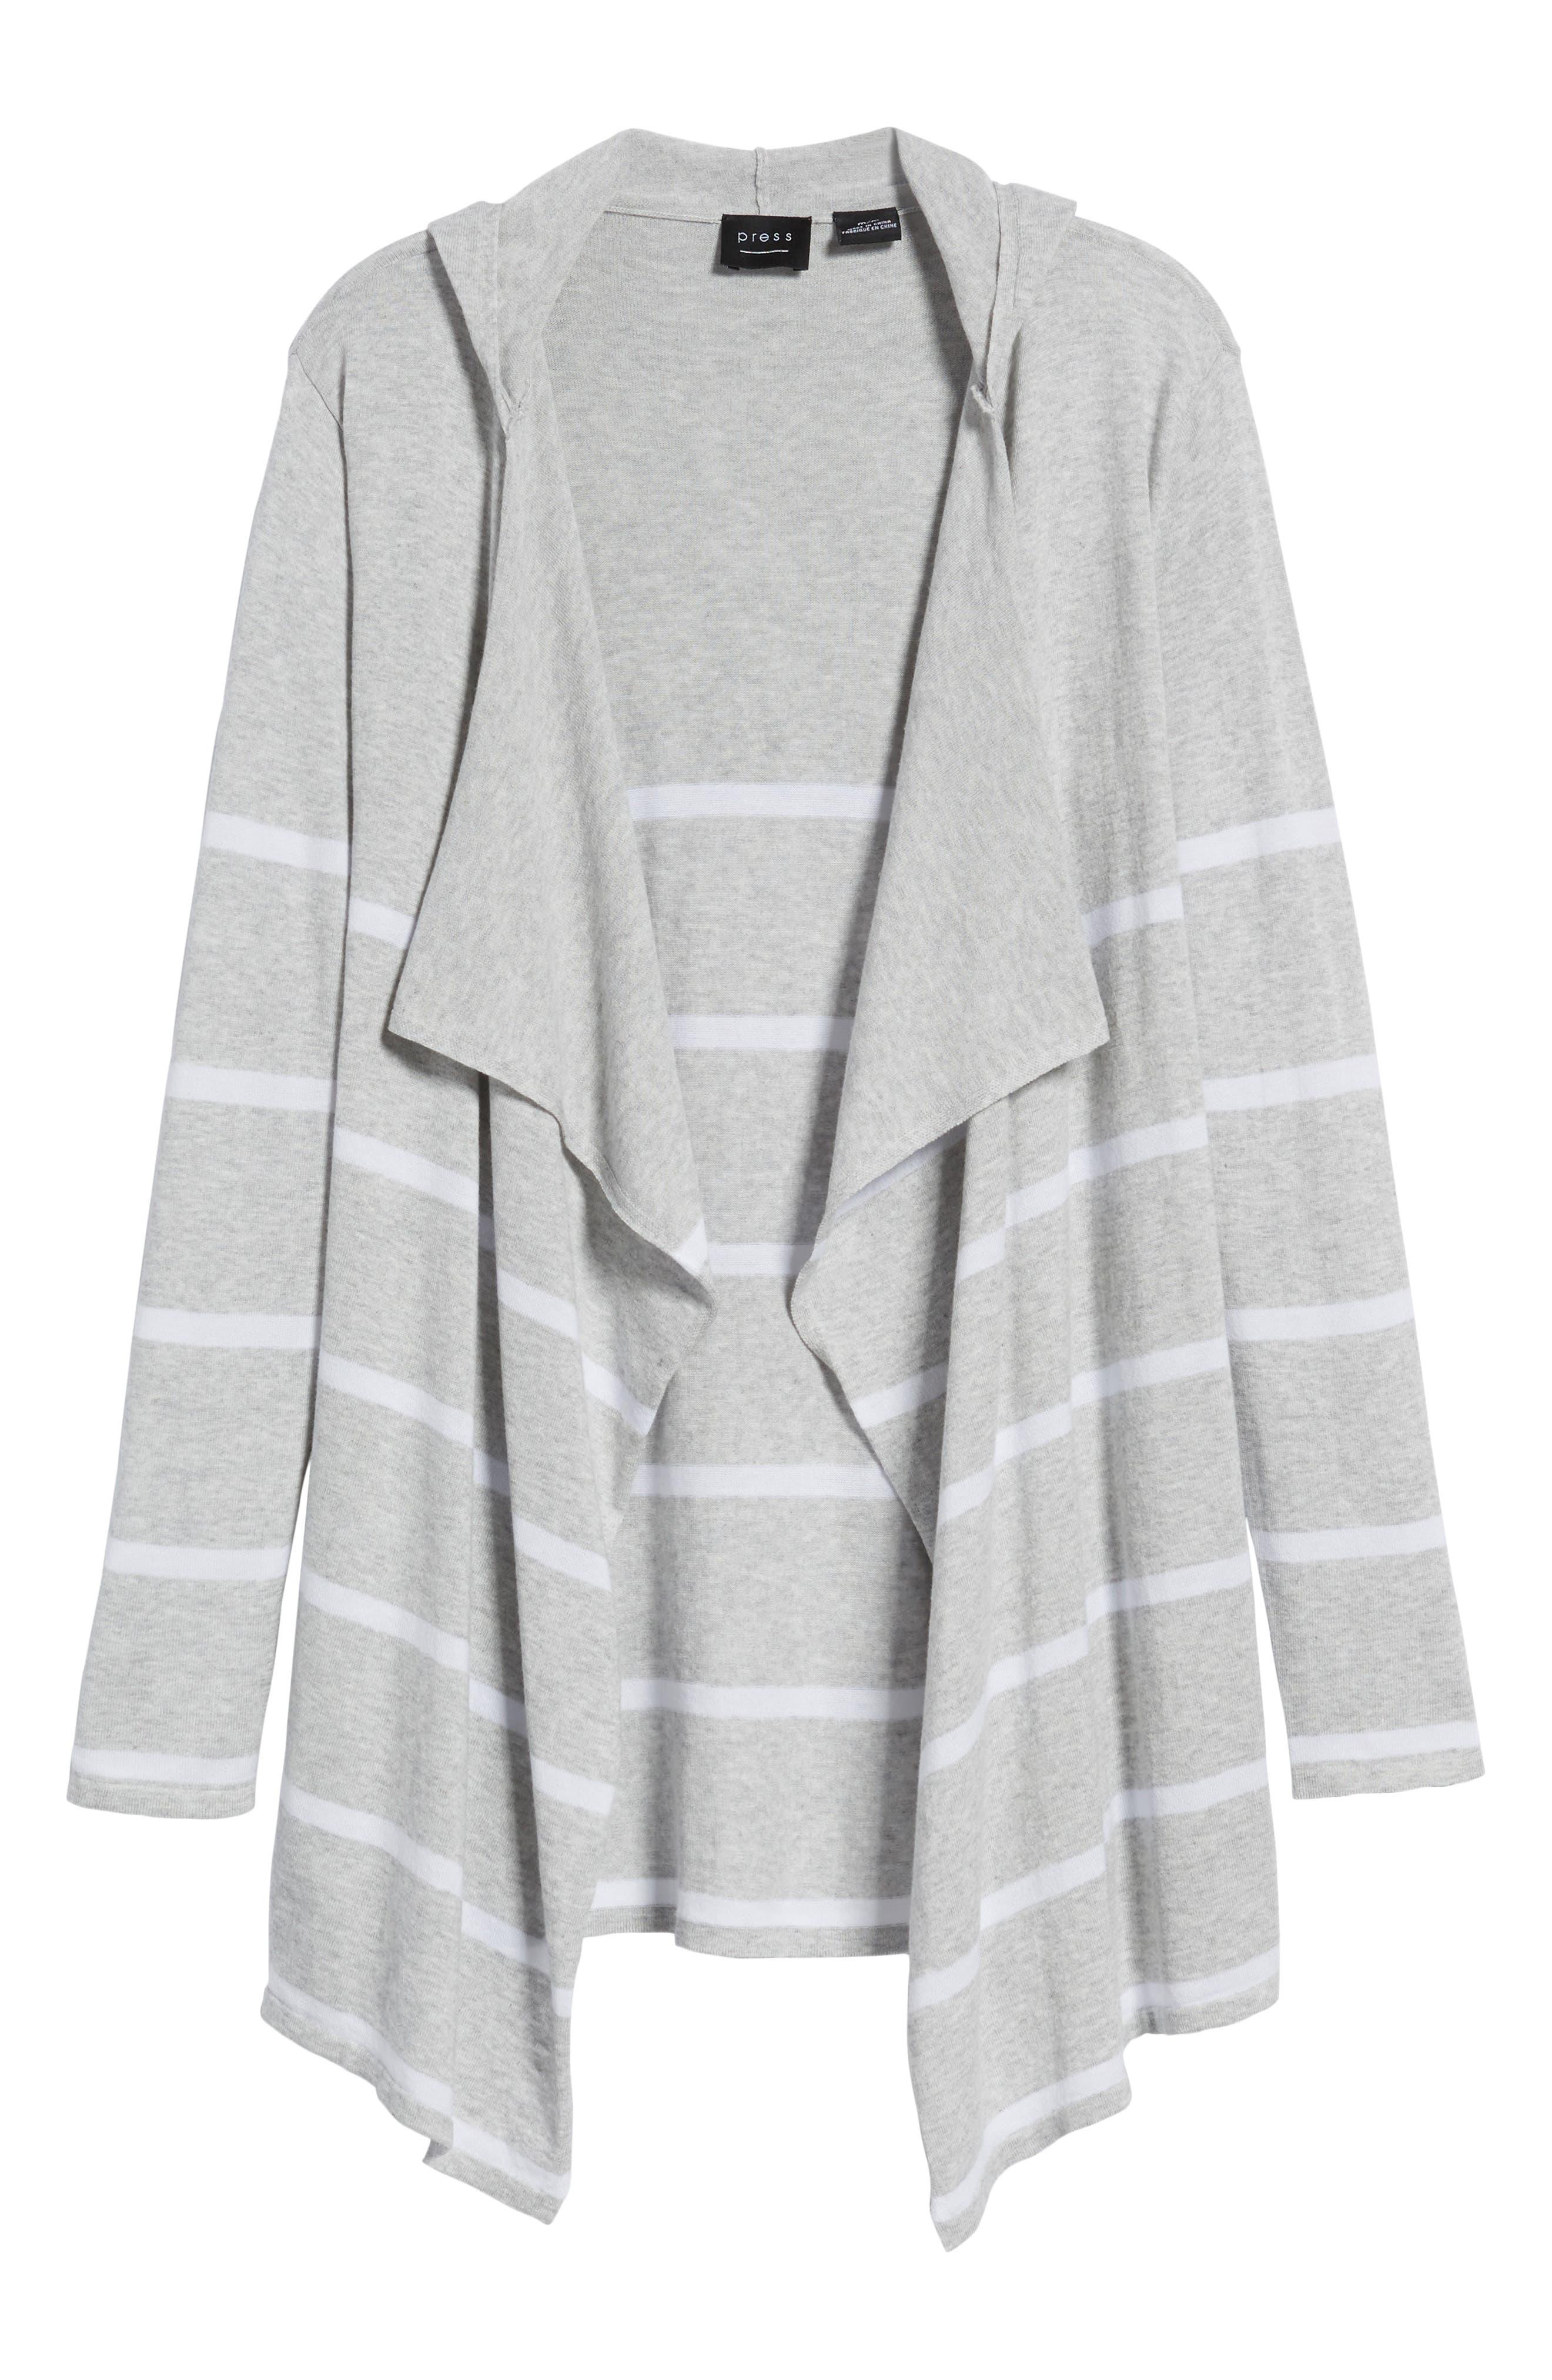 Flyaway Stripe Hoodie Cardigan,                             Alternate thumbnail 7, color,                             Pebble Grey Mex/ Warm White